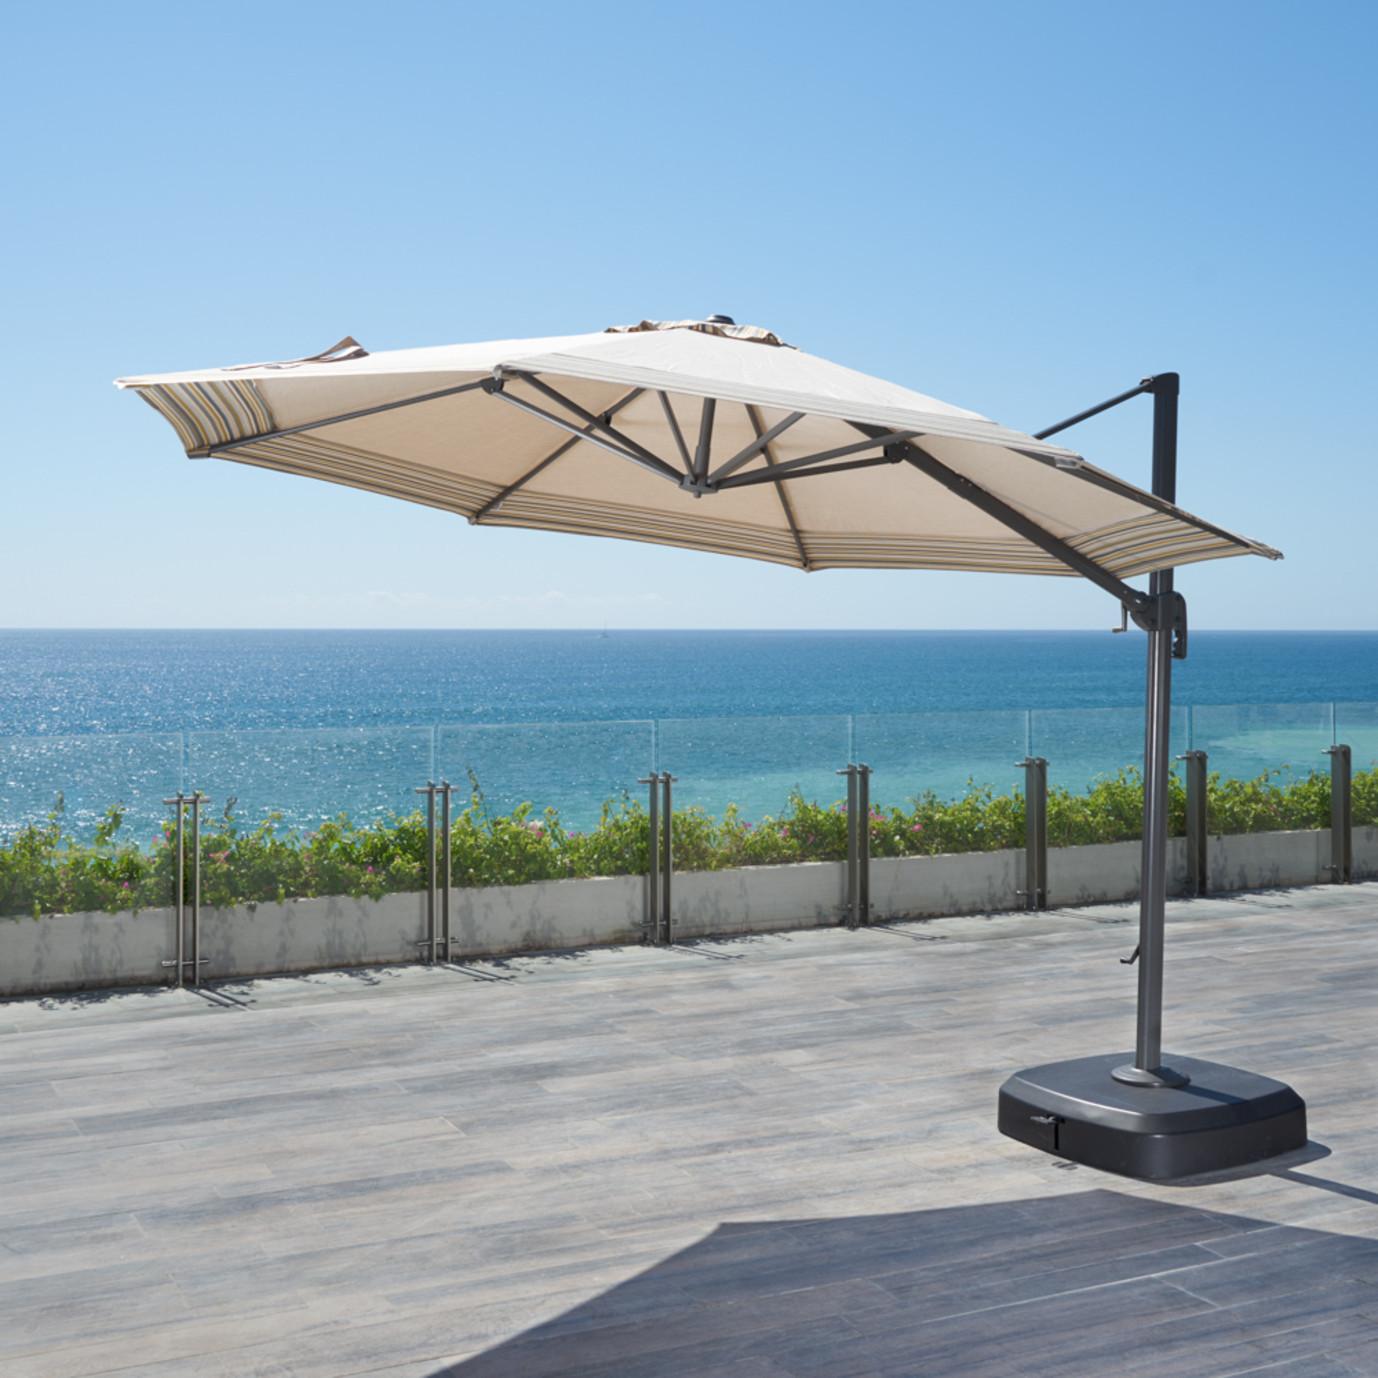 Vistano™ 11ft Round Grand Umbrella - Canvas Flax